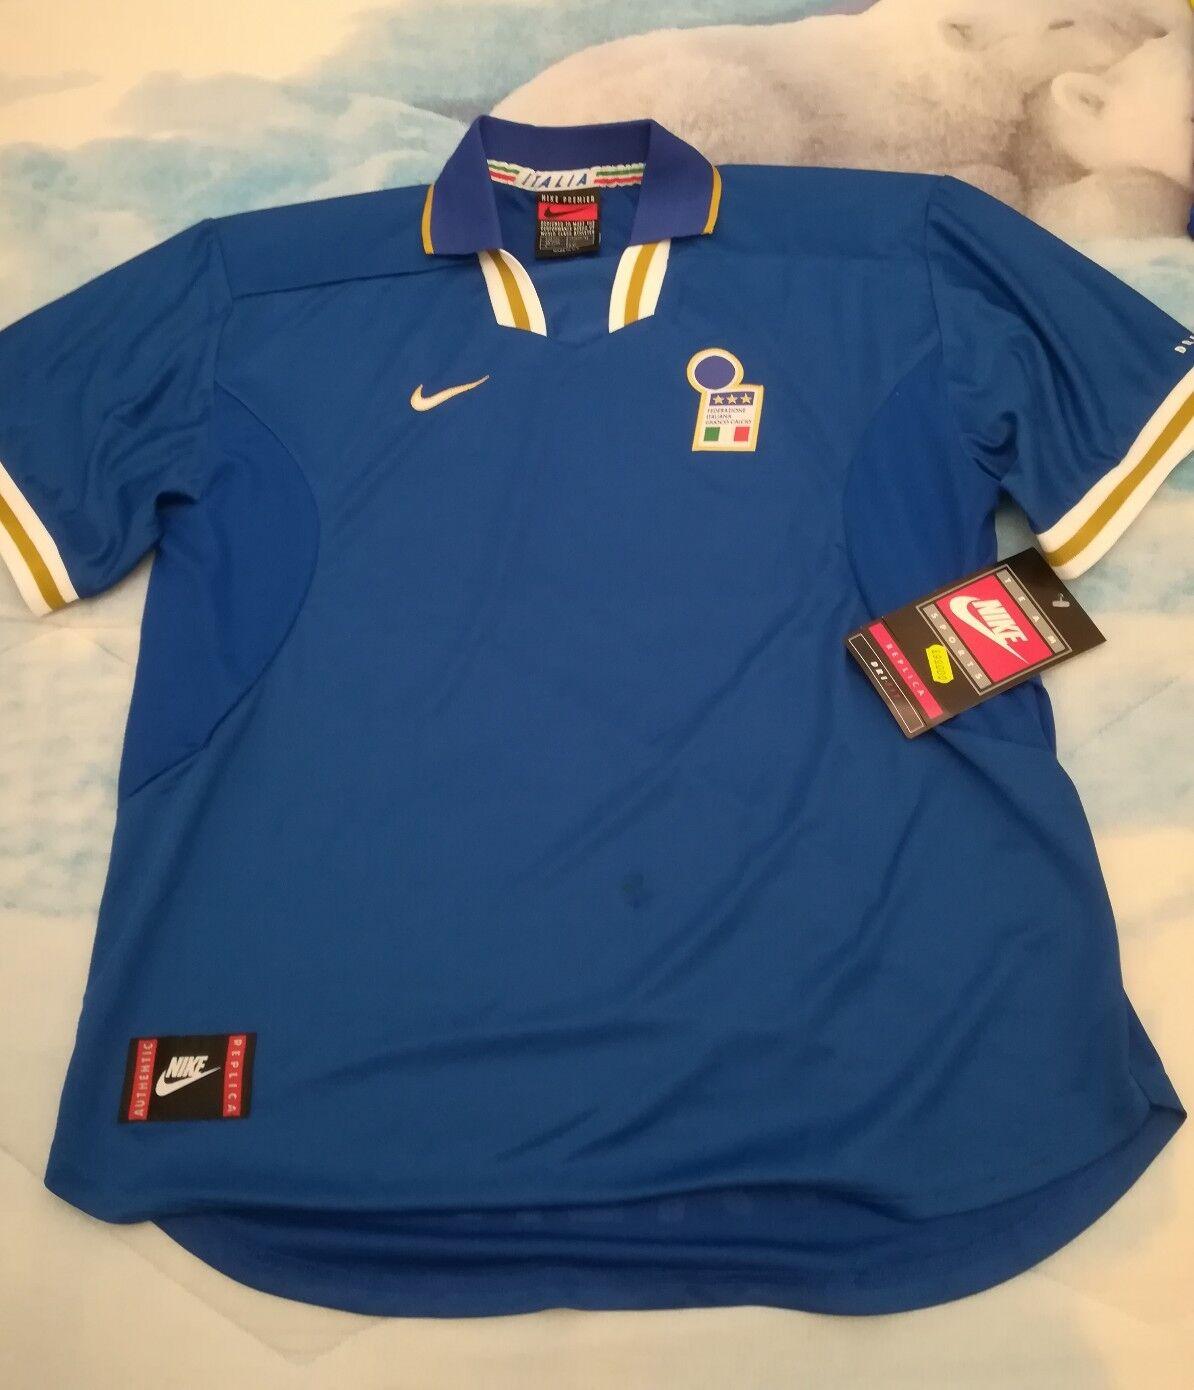 MAGLIA SHIR CAISETA VINTAGE OFFICIËLE ITALIË FOTOTAL Calcio nieuw NO Matchwear